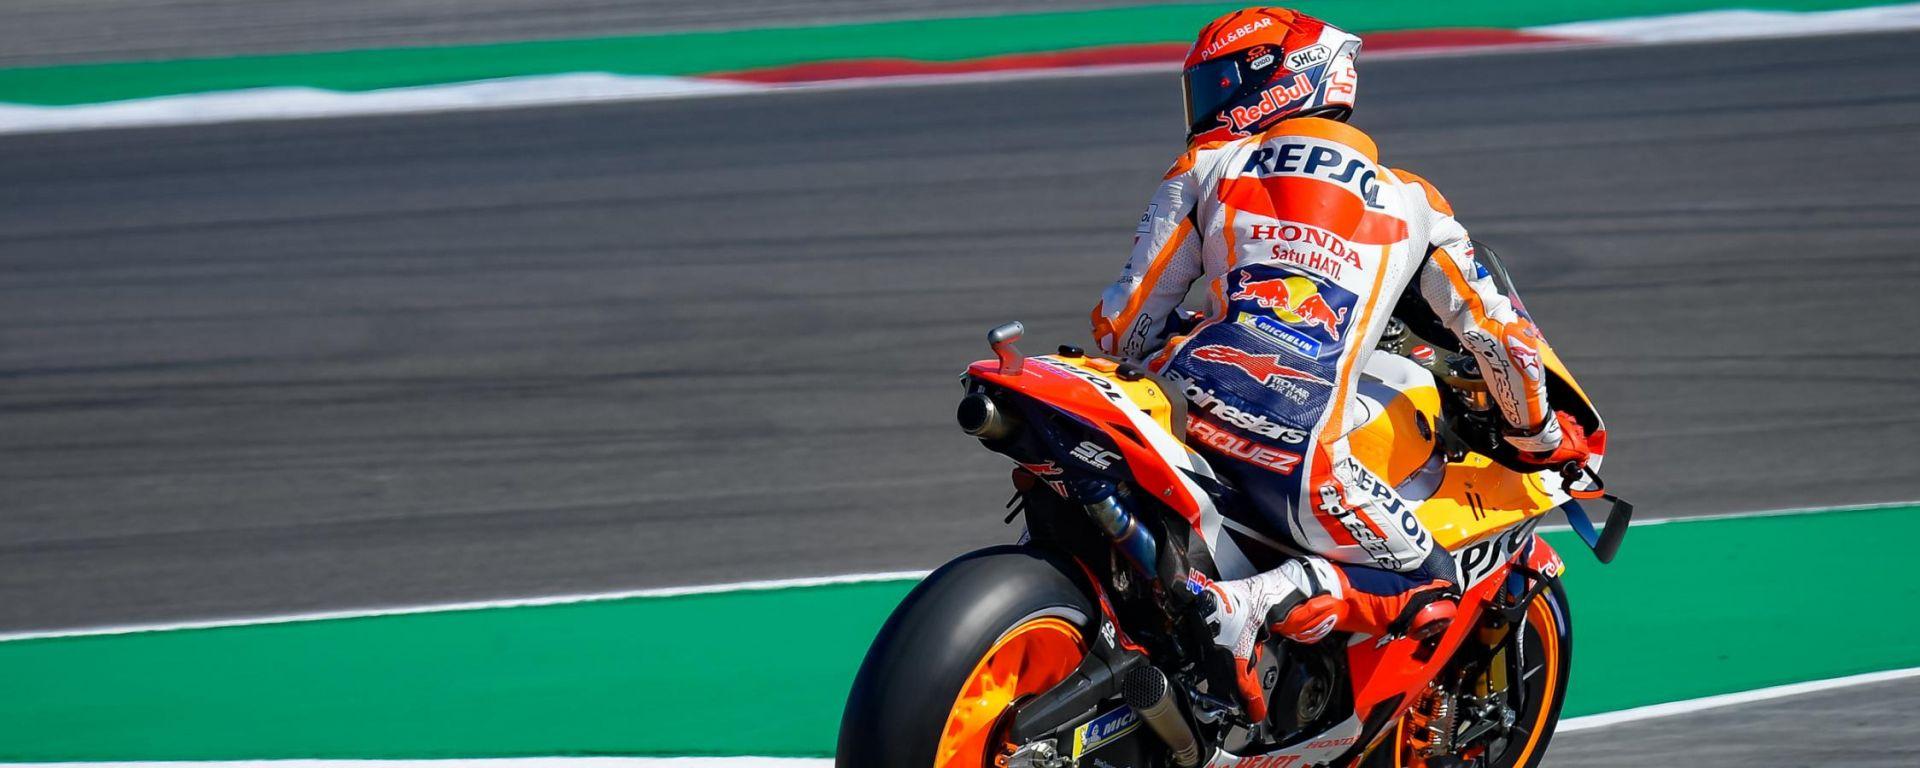 MotoGP, GP Portogallo 2021: Marc Marquez (Honda)